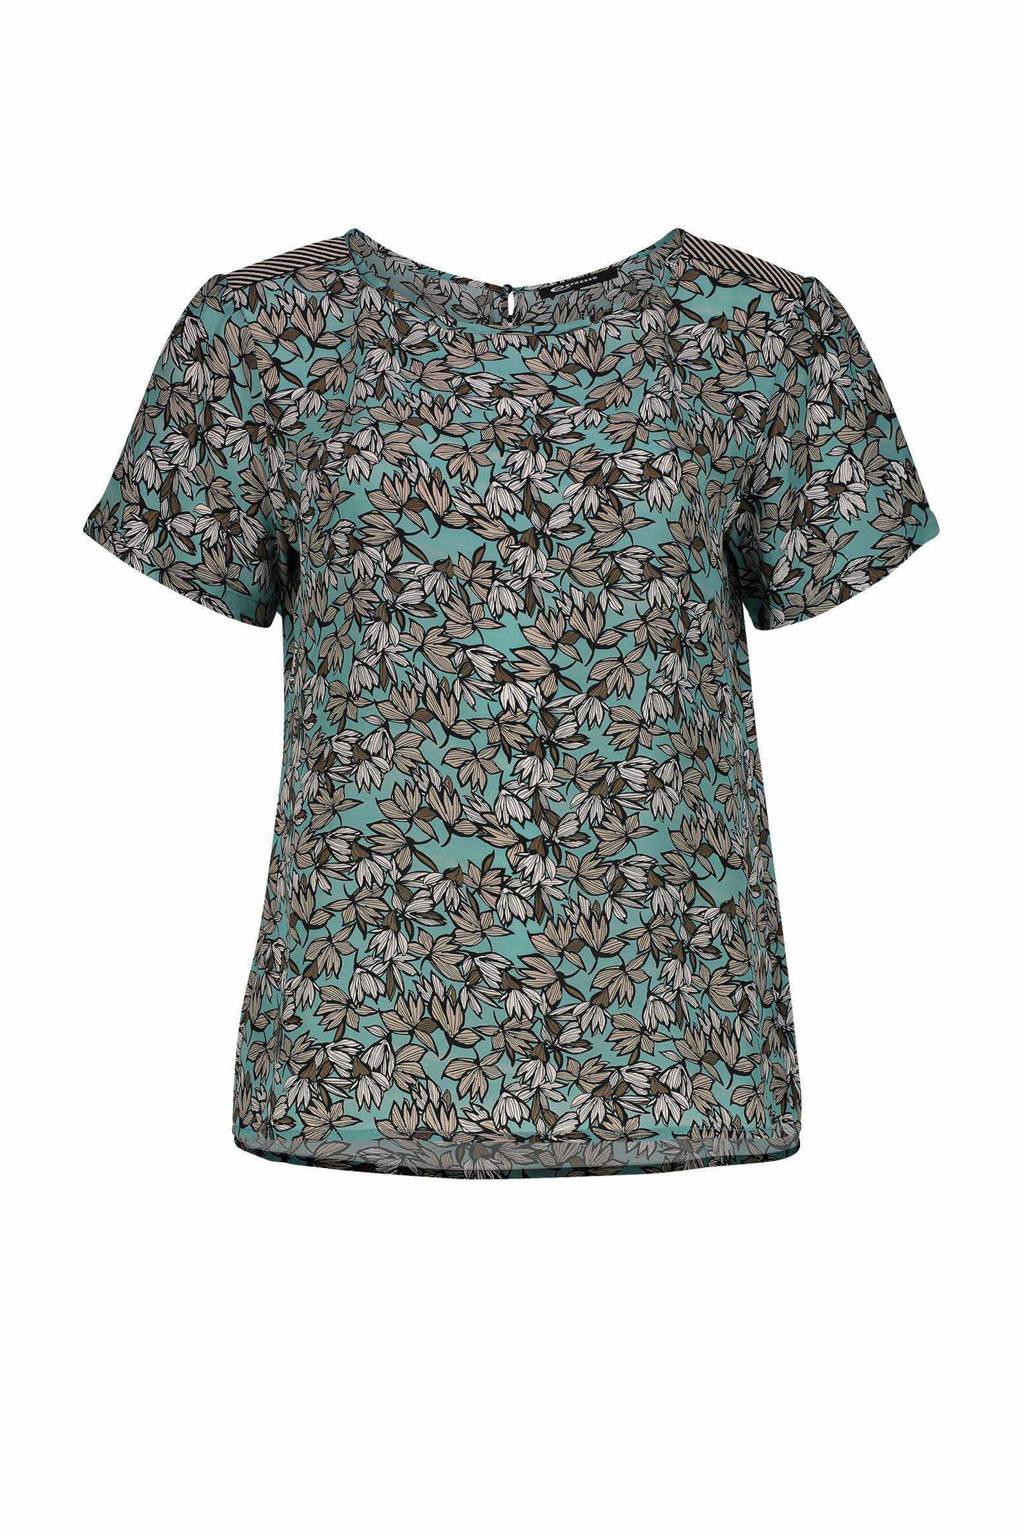 Expresso blouse met all over print mineral blue Jilian, Lichtblauw/olijfgroen/beige